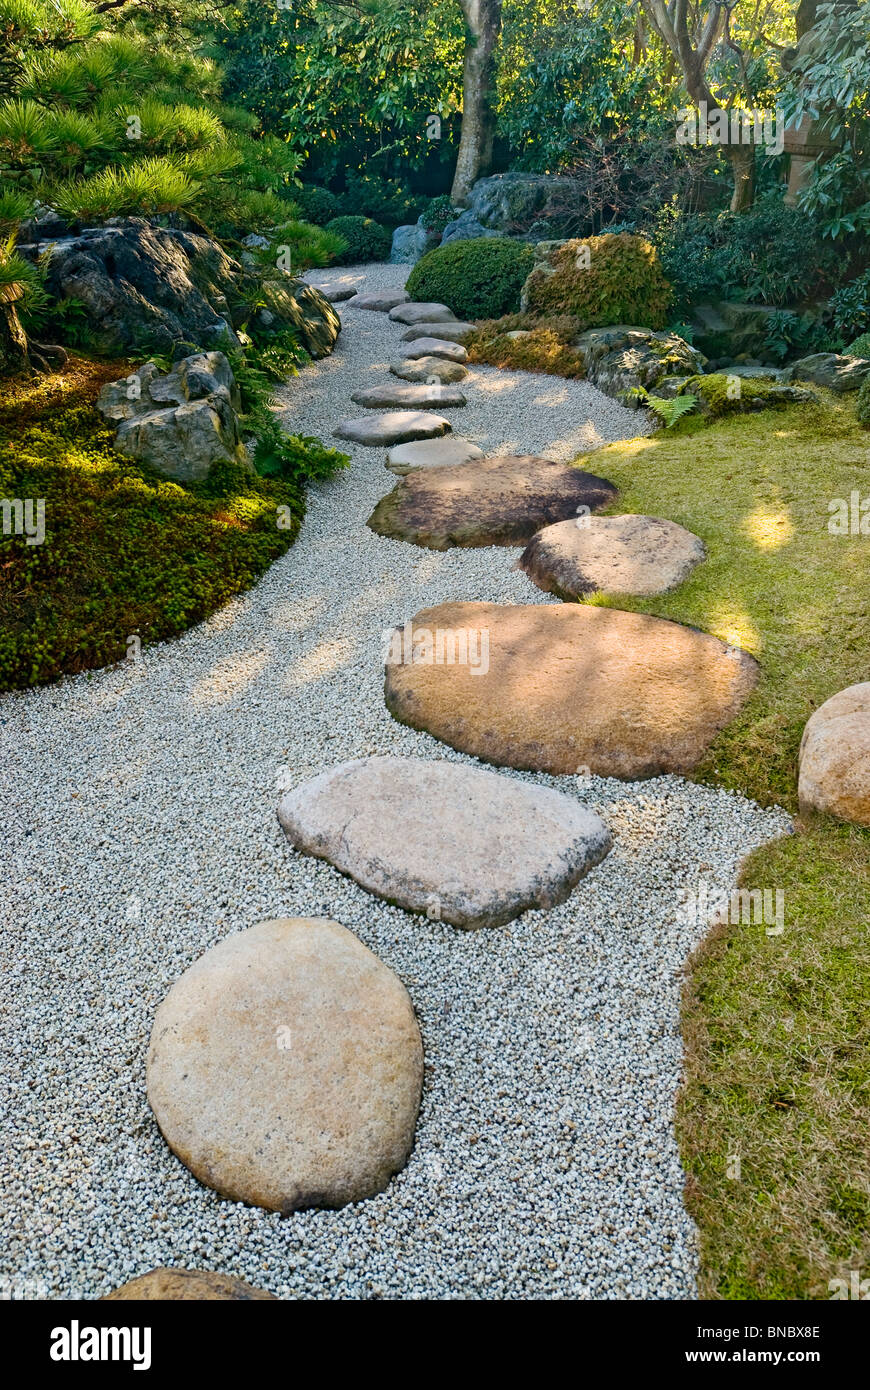 Japanese Rock Garden Japanese Rock Garden Stock Photos Japanese Rock Garden Stock